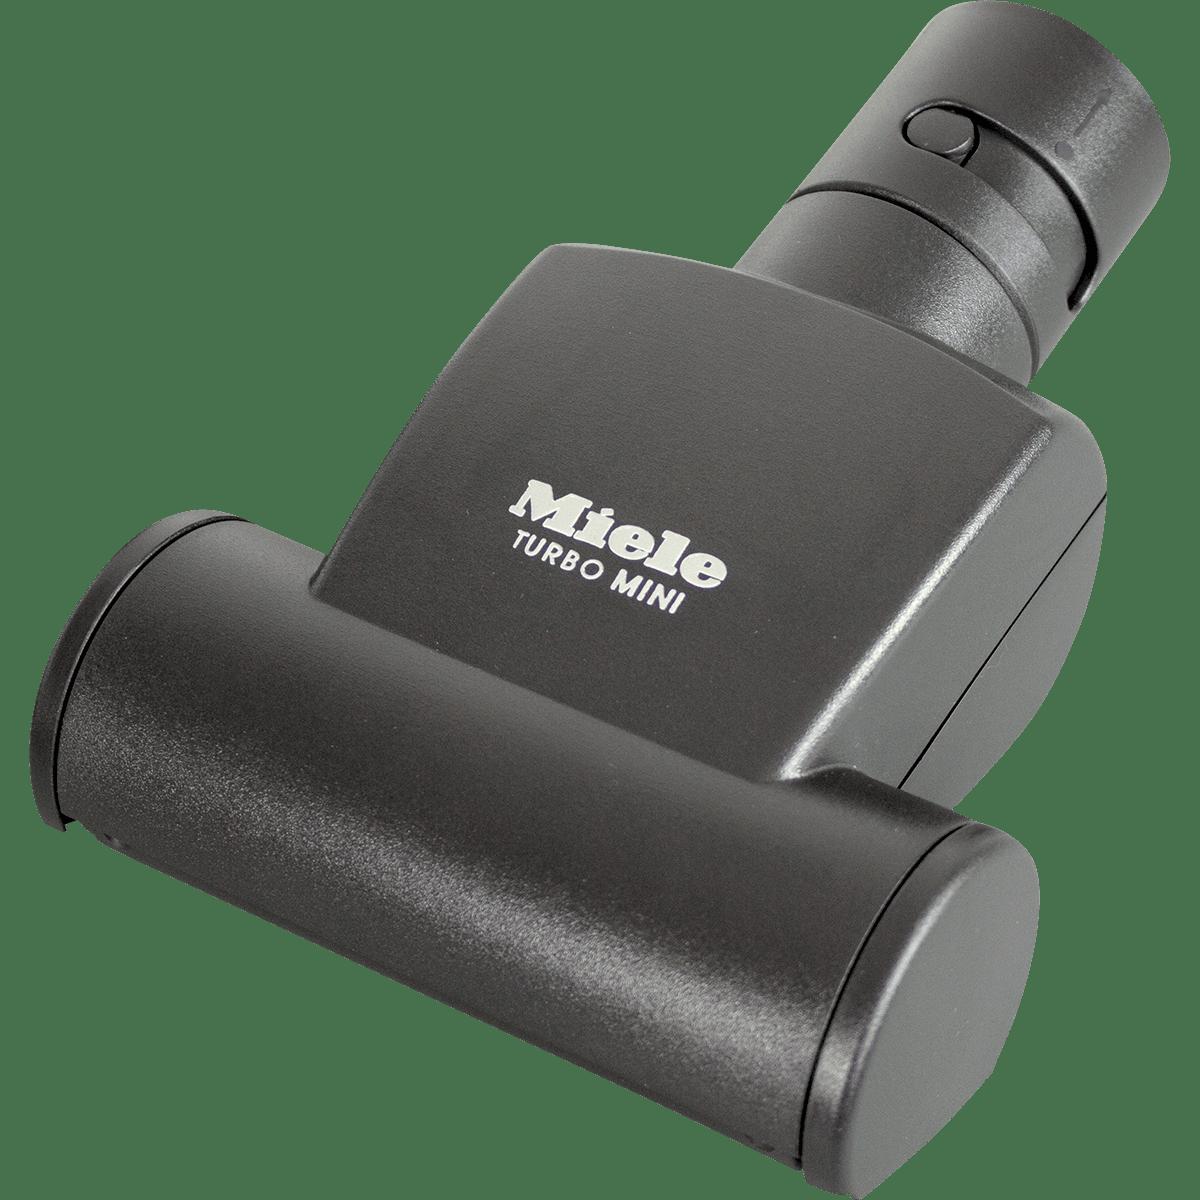 Miele STB101 Handheld Turbobrush mi2274